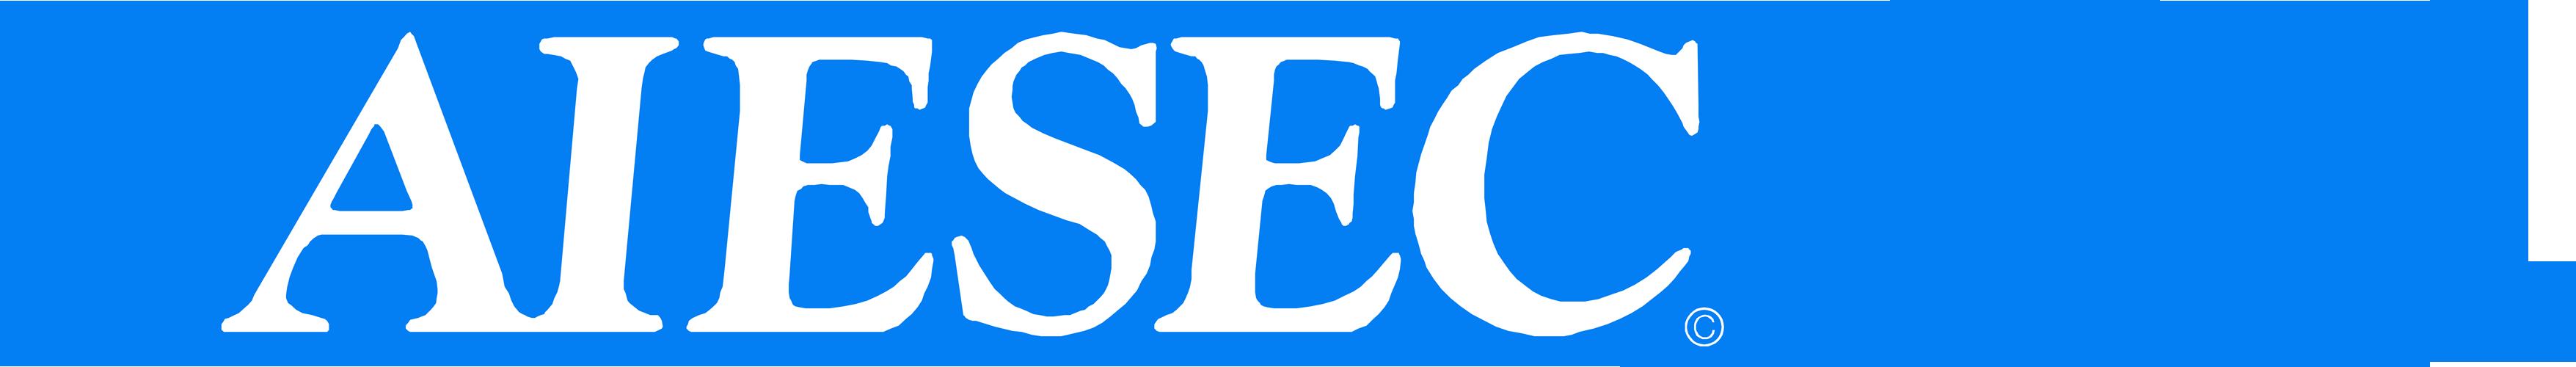 AIESEC Craiova logo